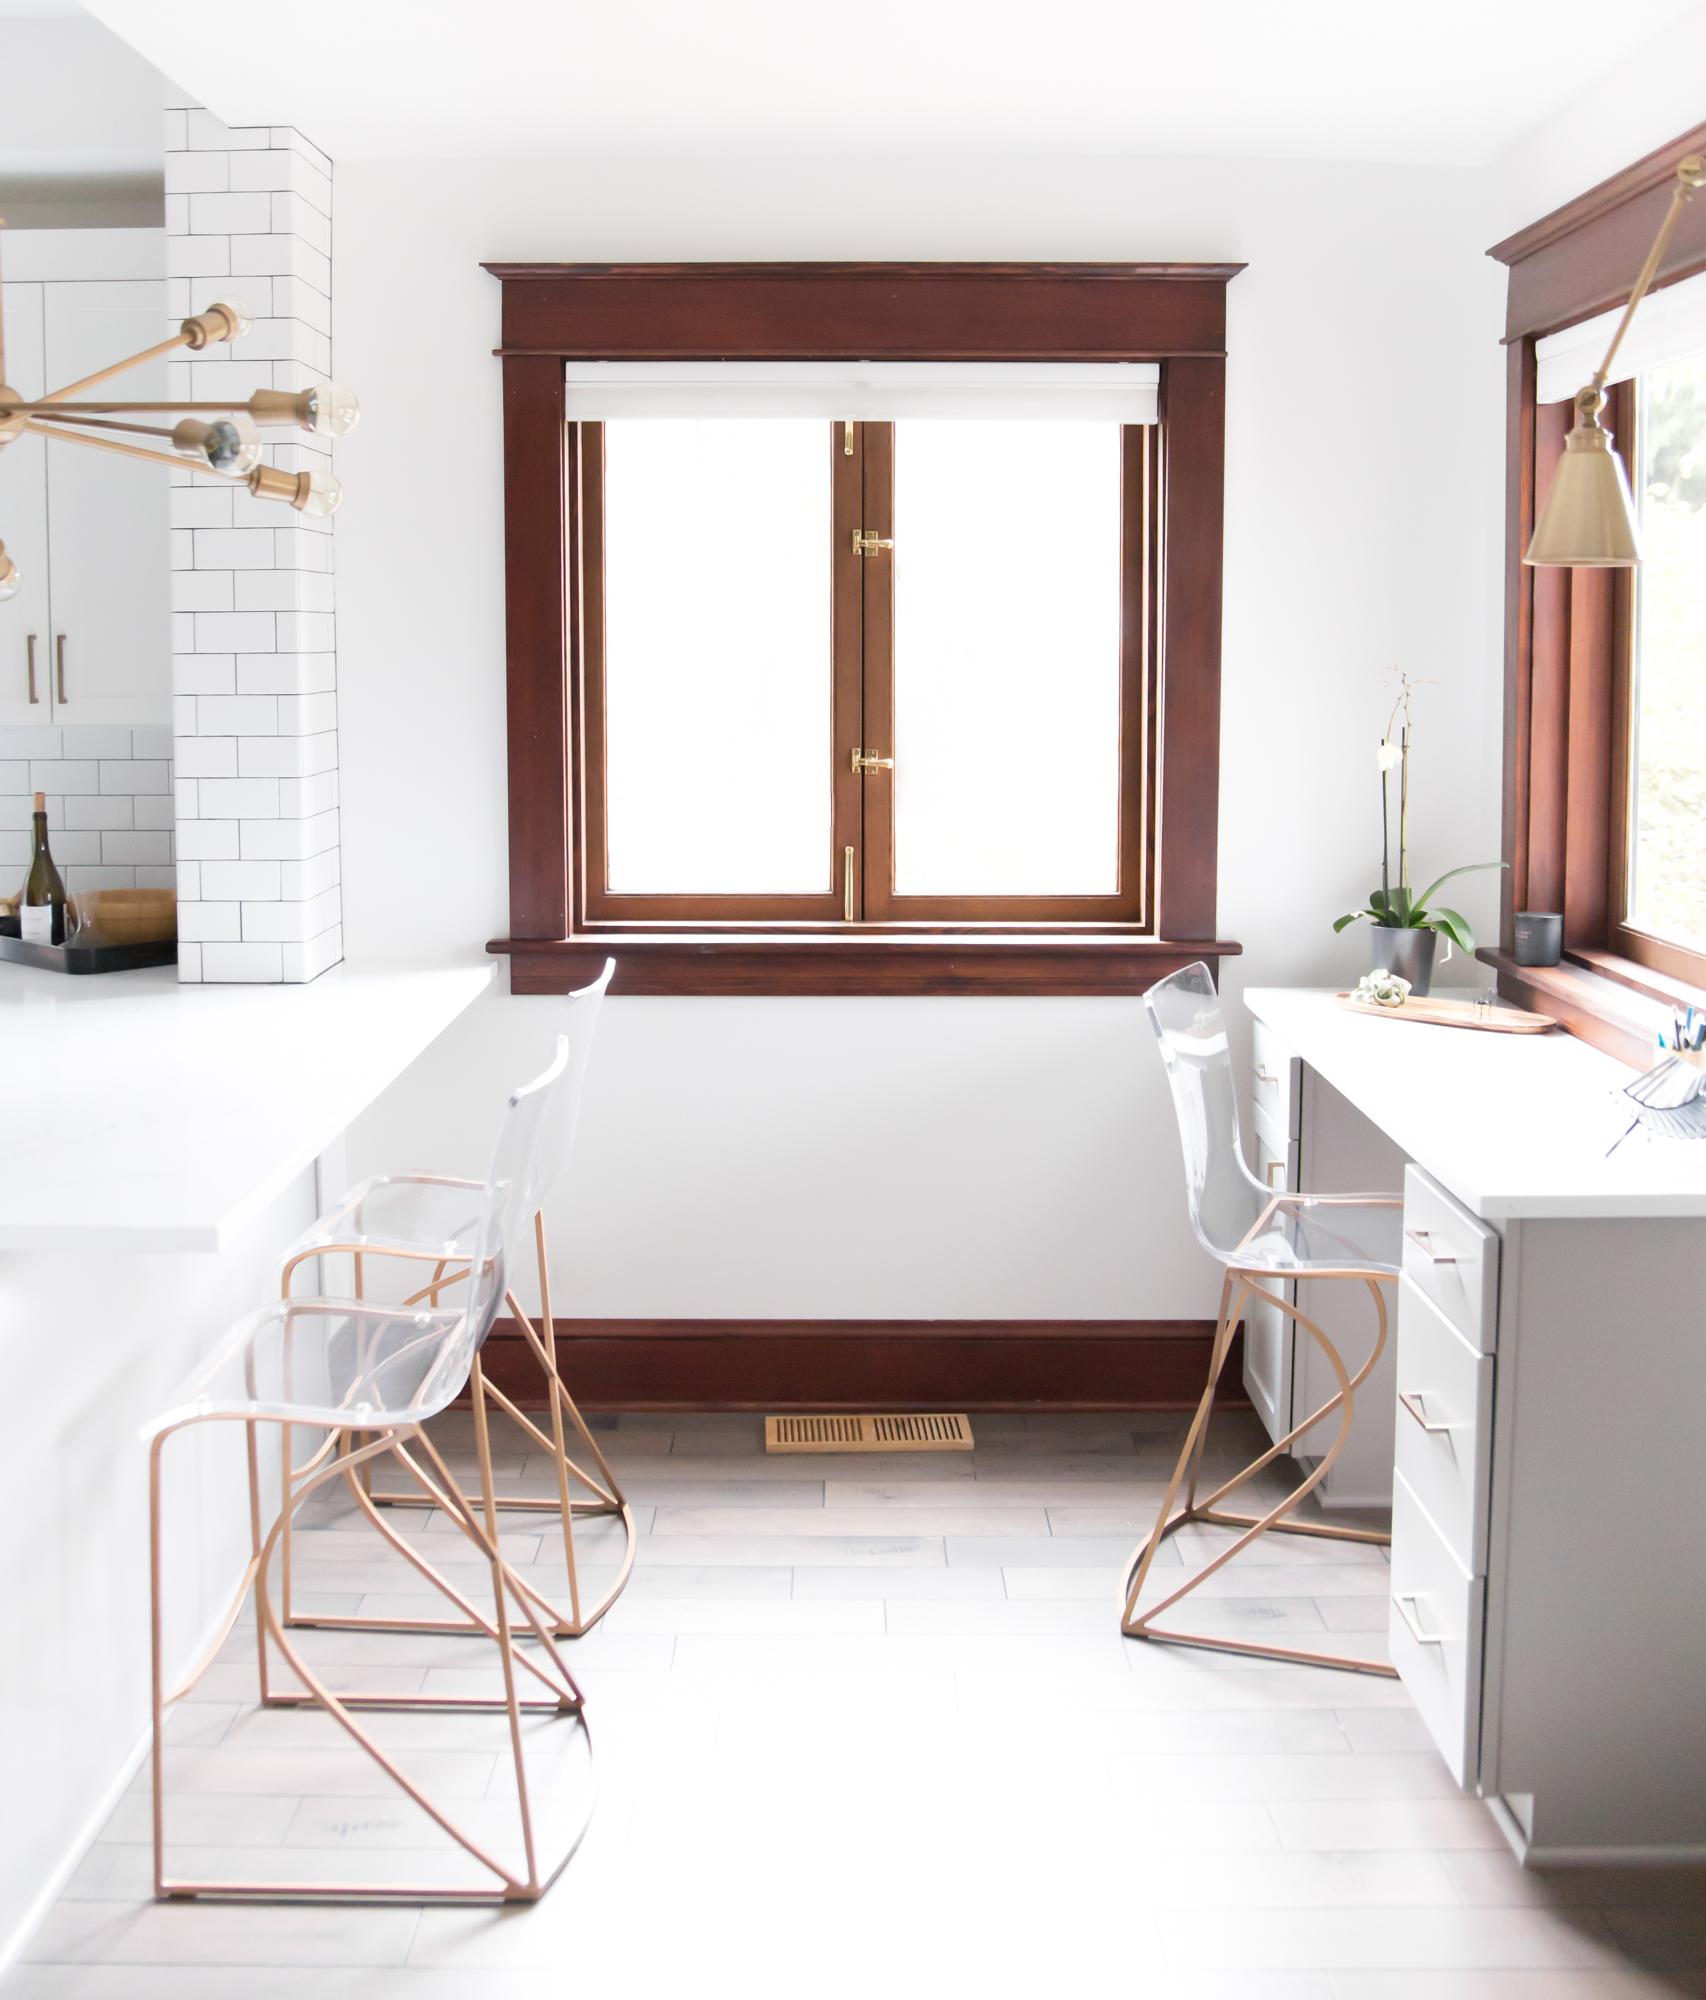 olivia_ashton_photography_interior_design9